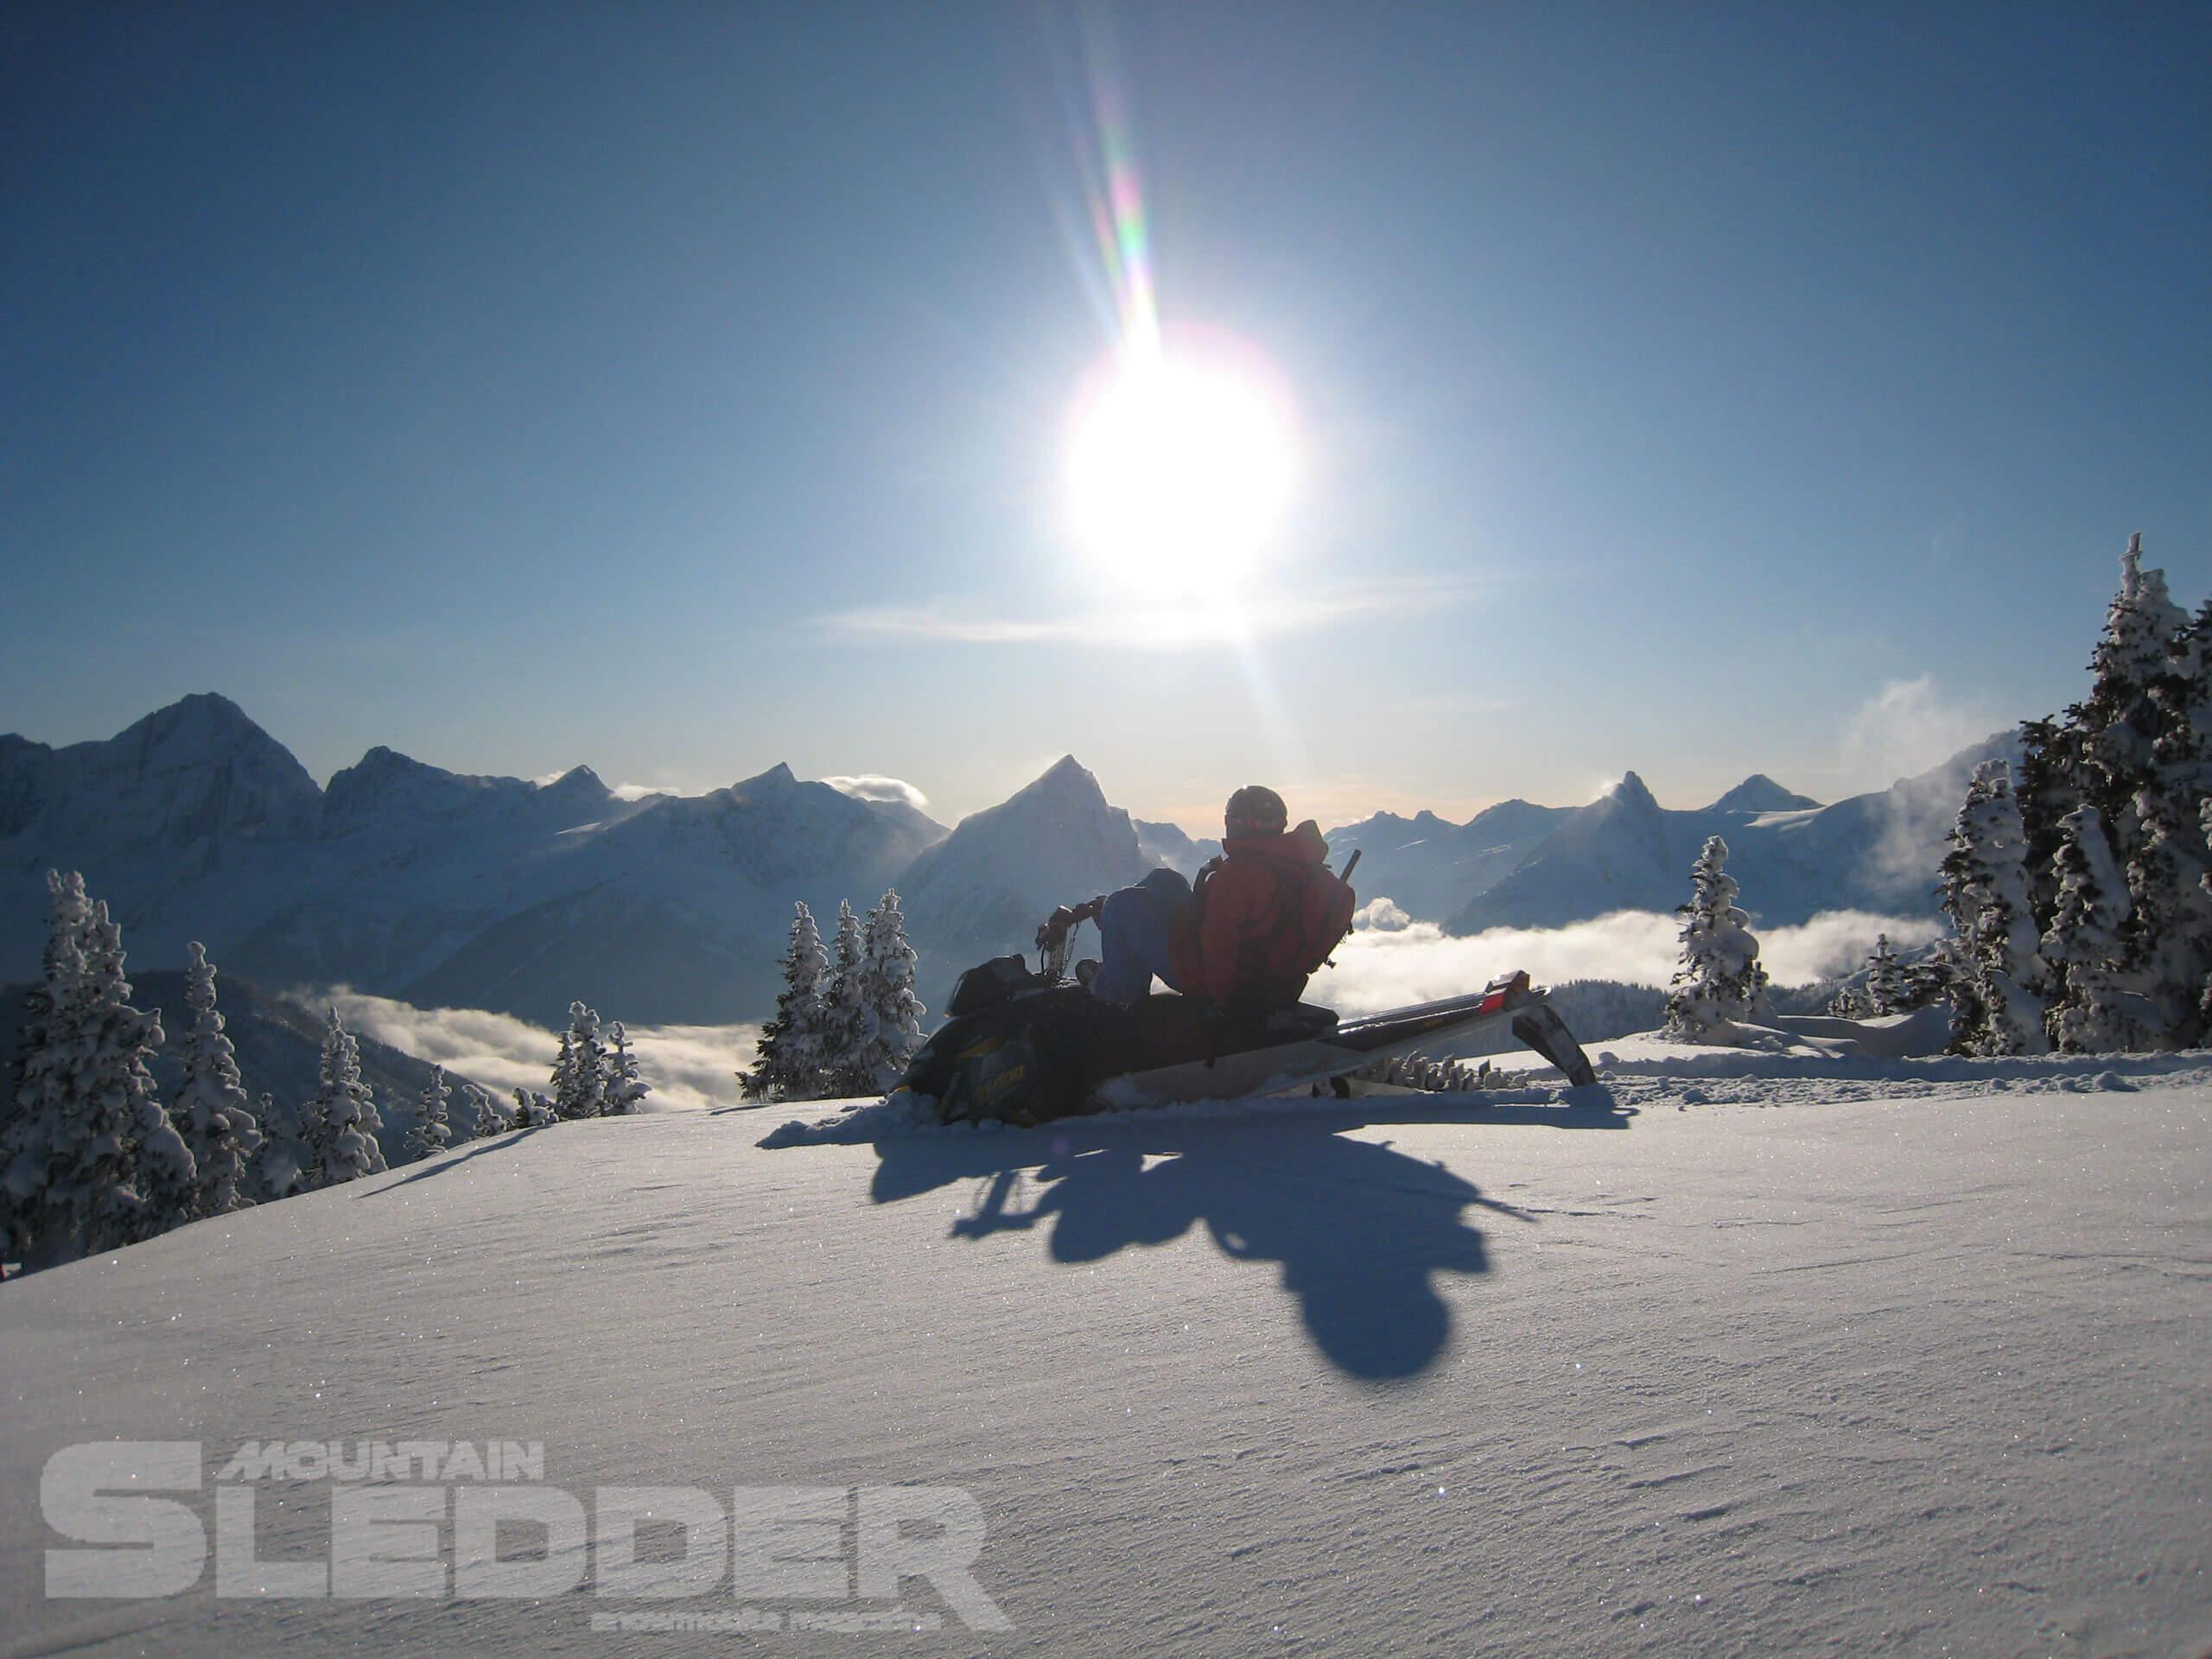 Quartz Creek Snowmobile Area near Golden, BC